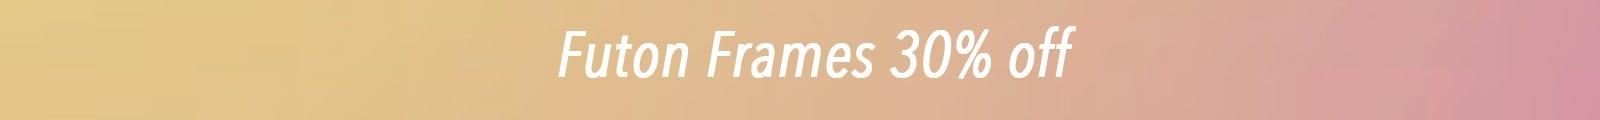 Futon Frames 30% off